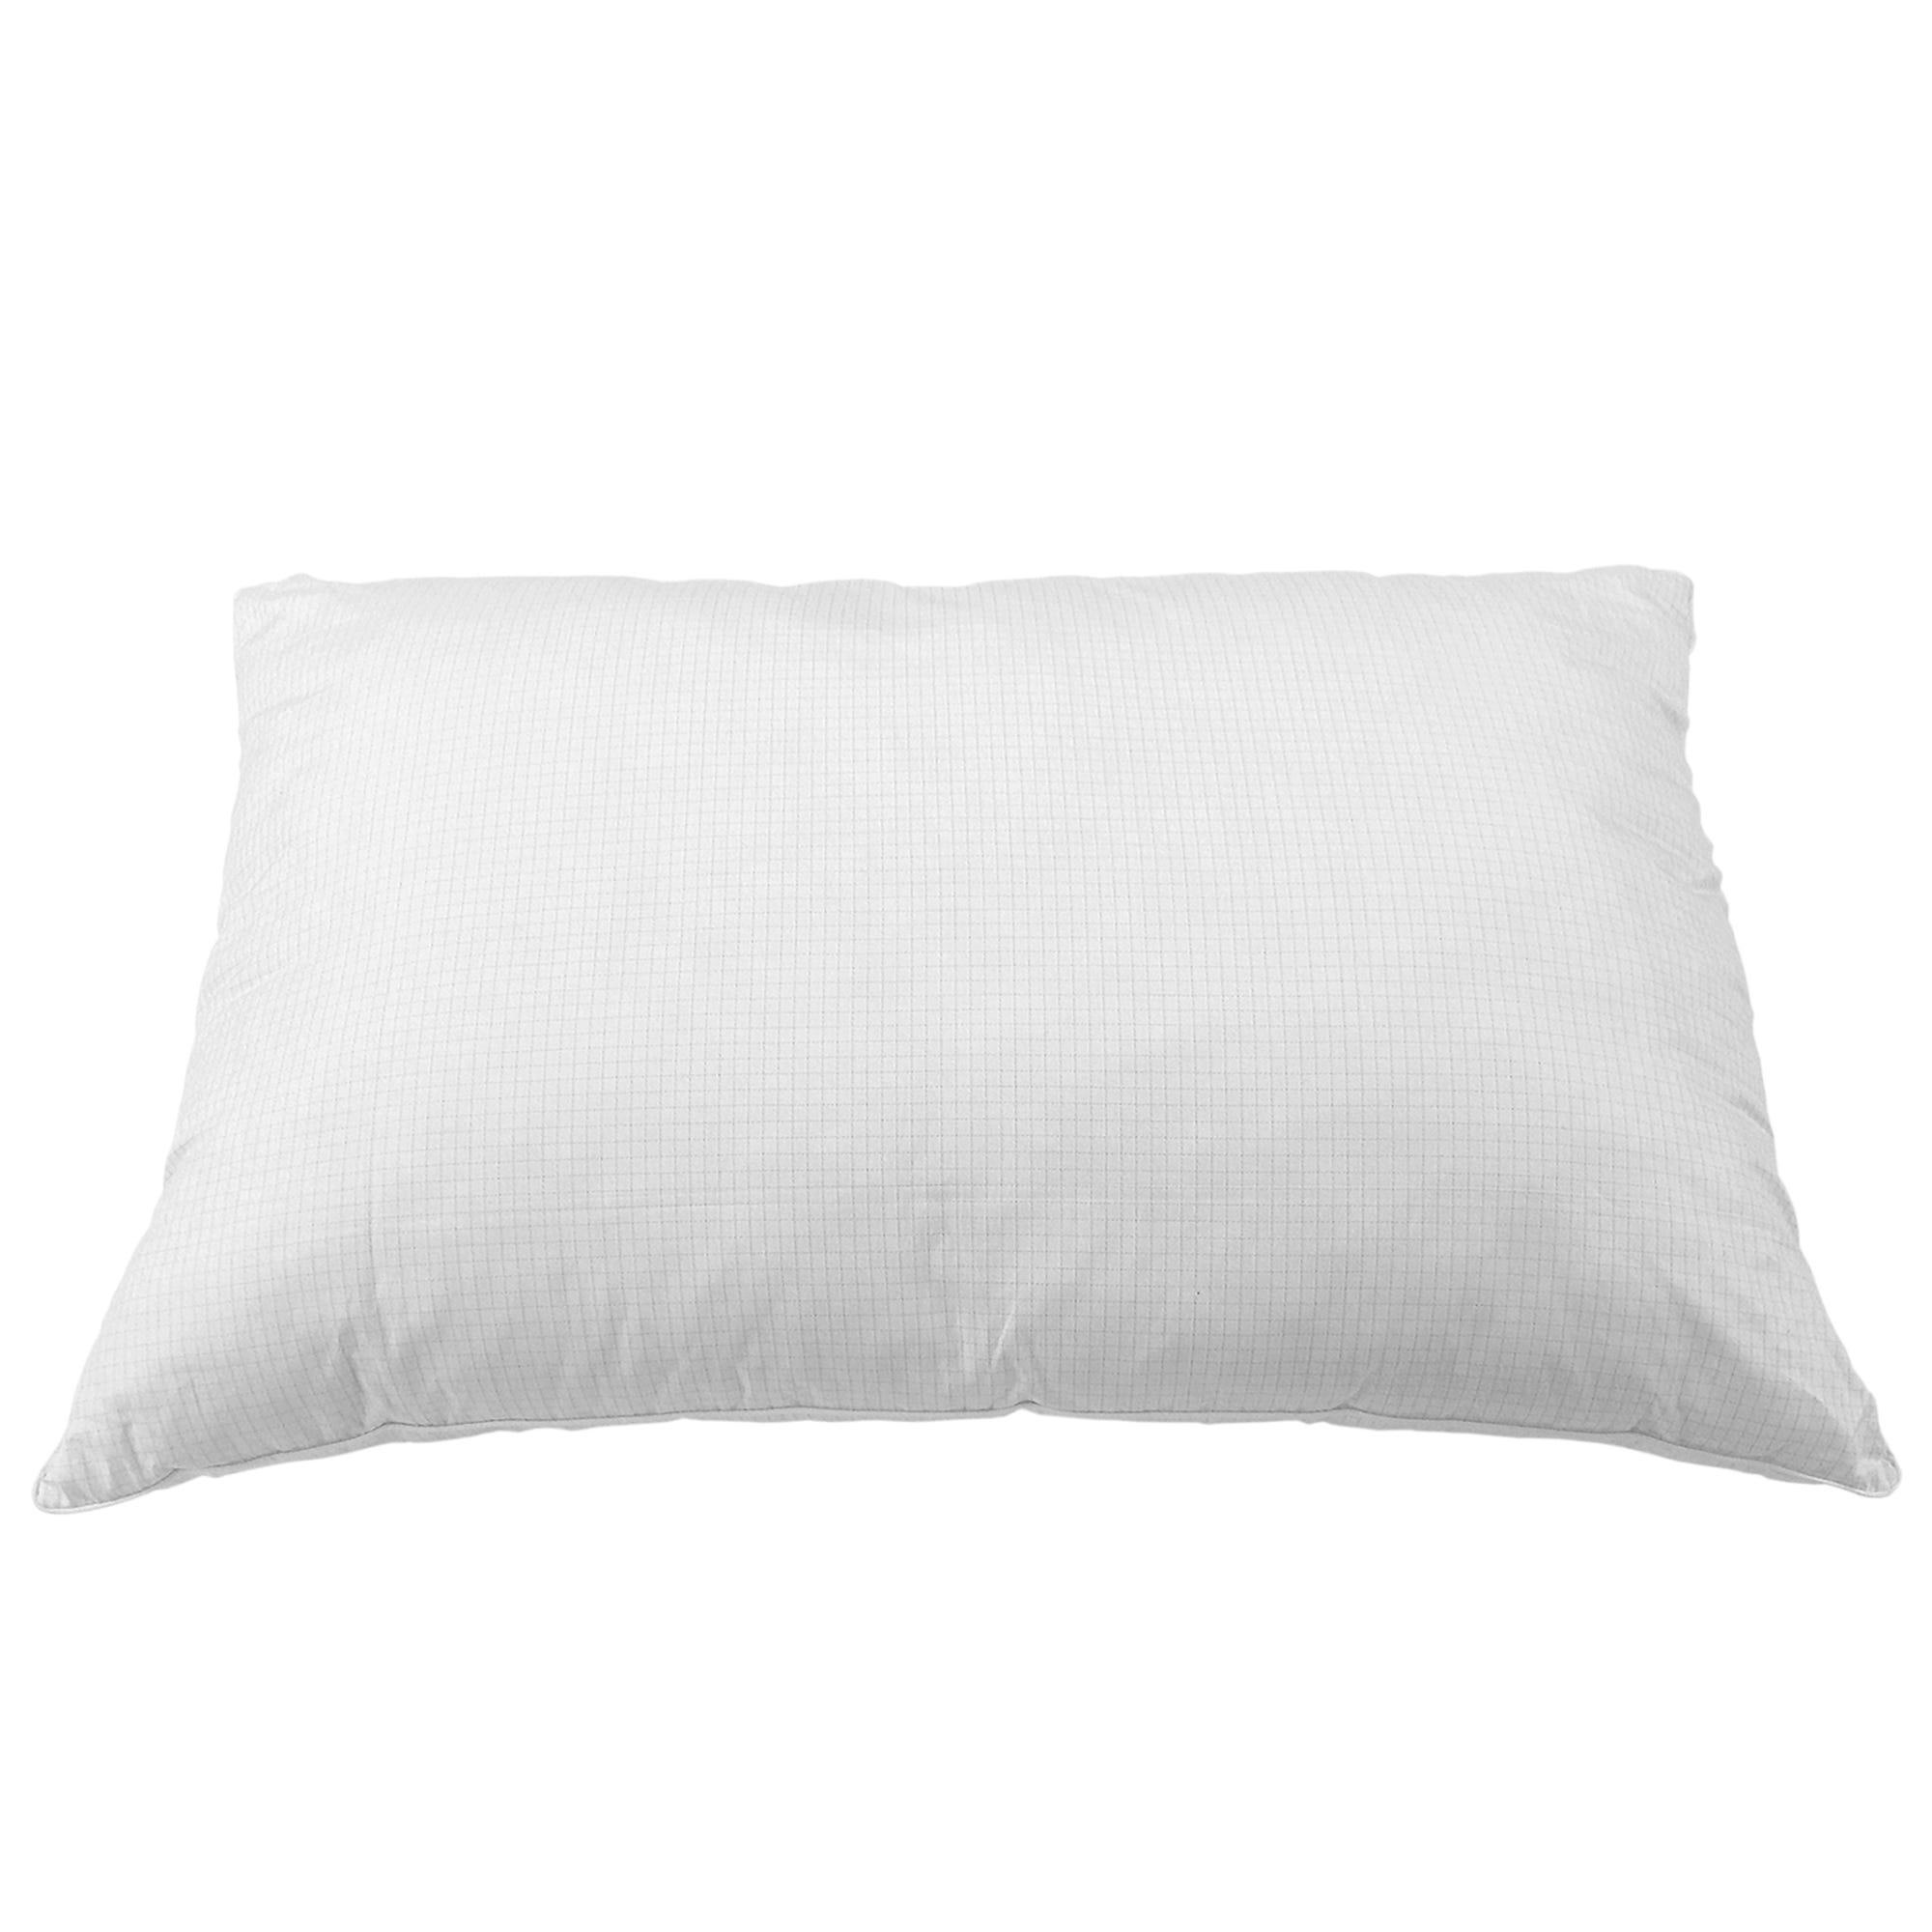 Almohada estándar de poliéster Spring Air® color plata